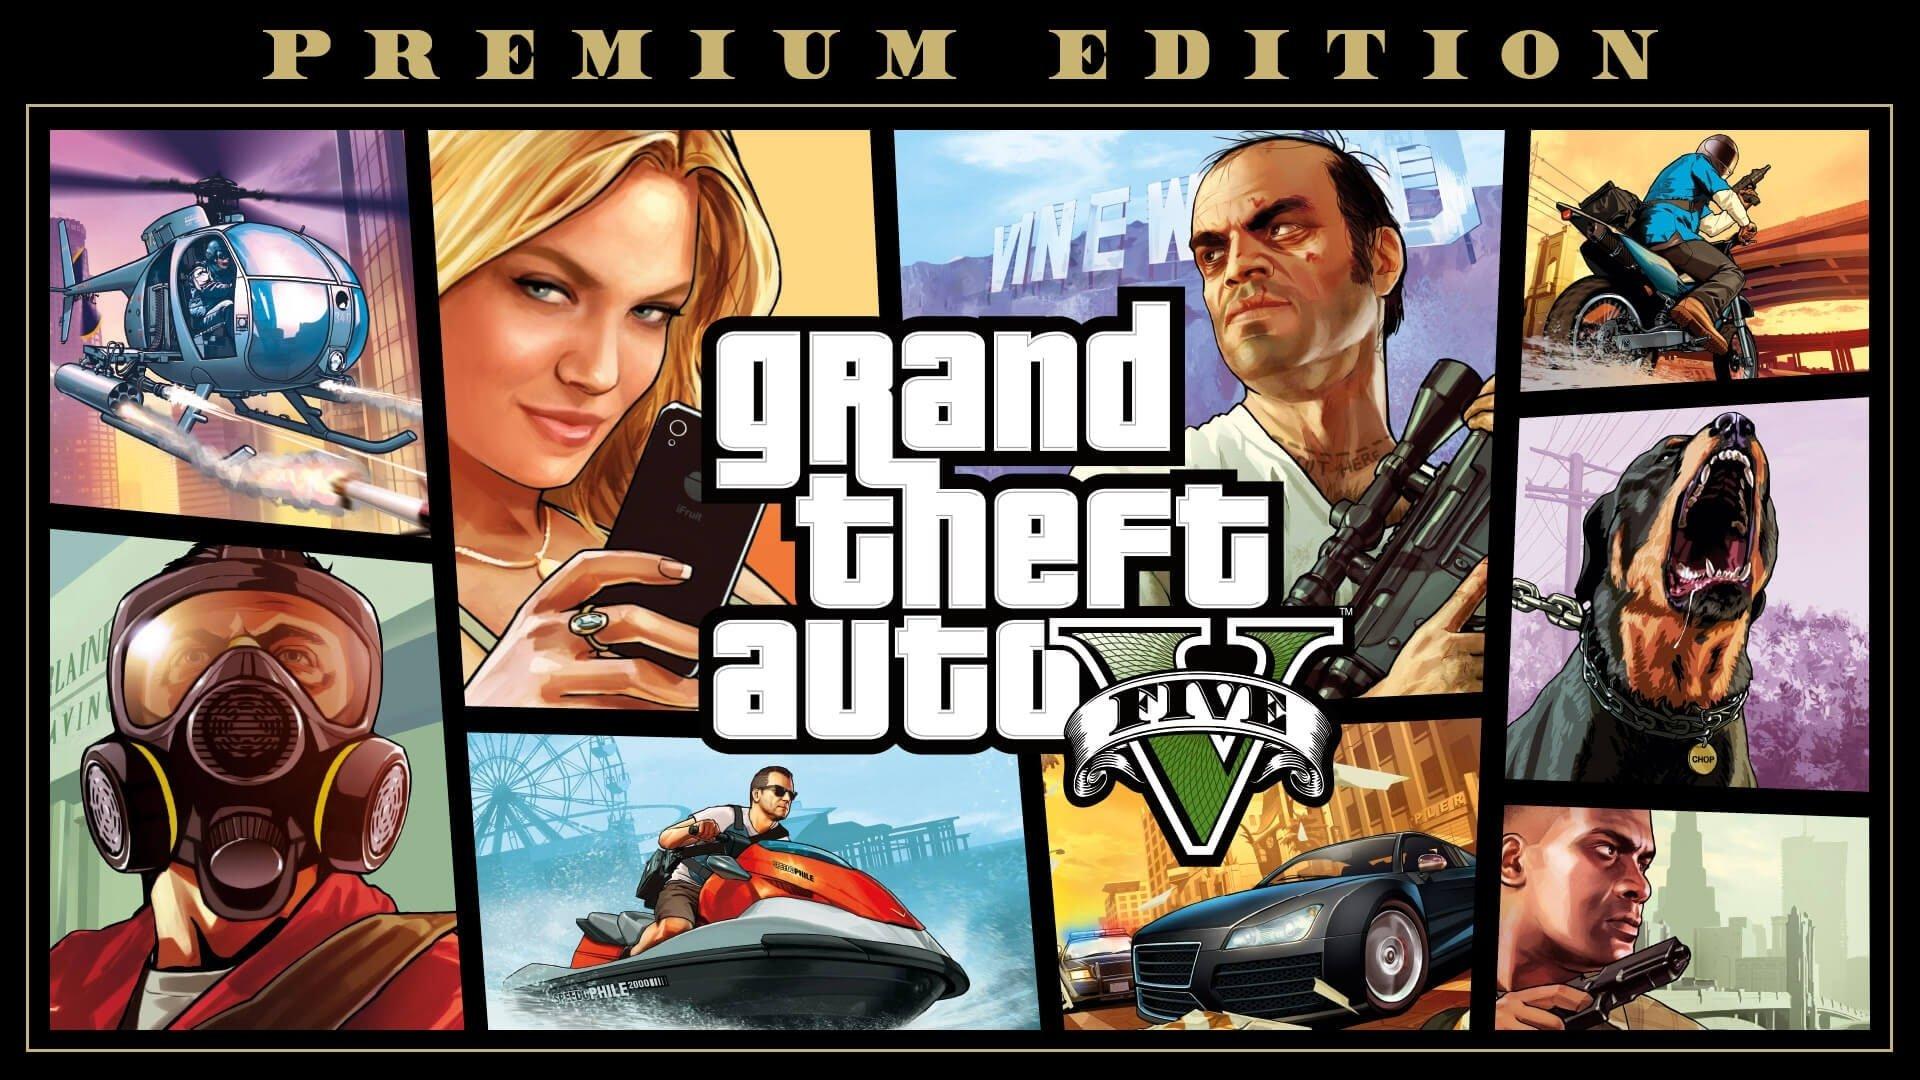 EPİC GAMES'TEN GTA 5 MÜJDESİ